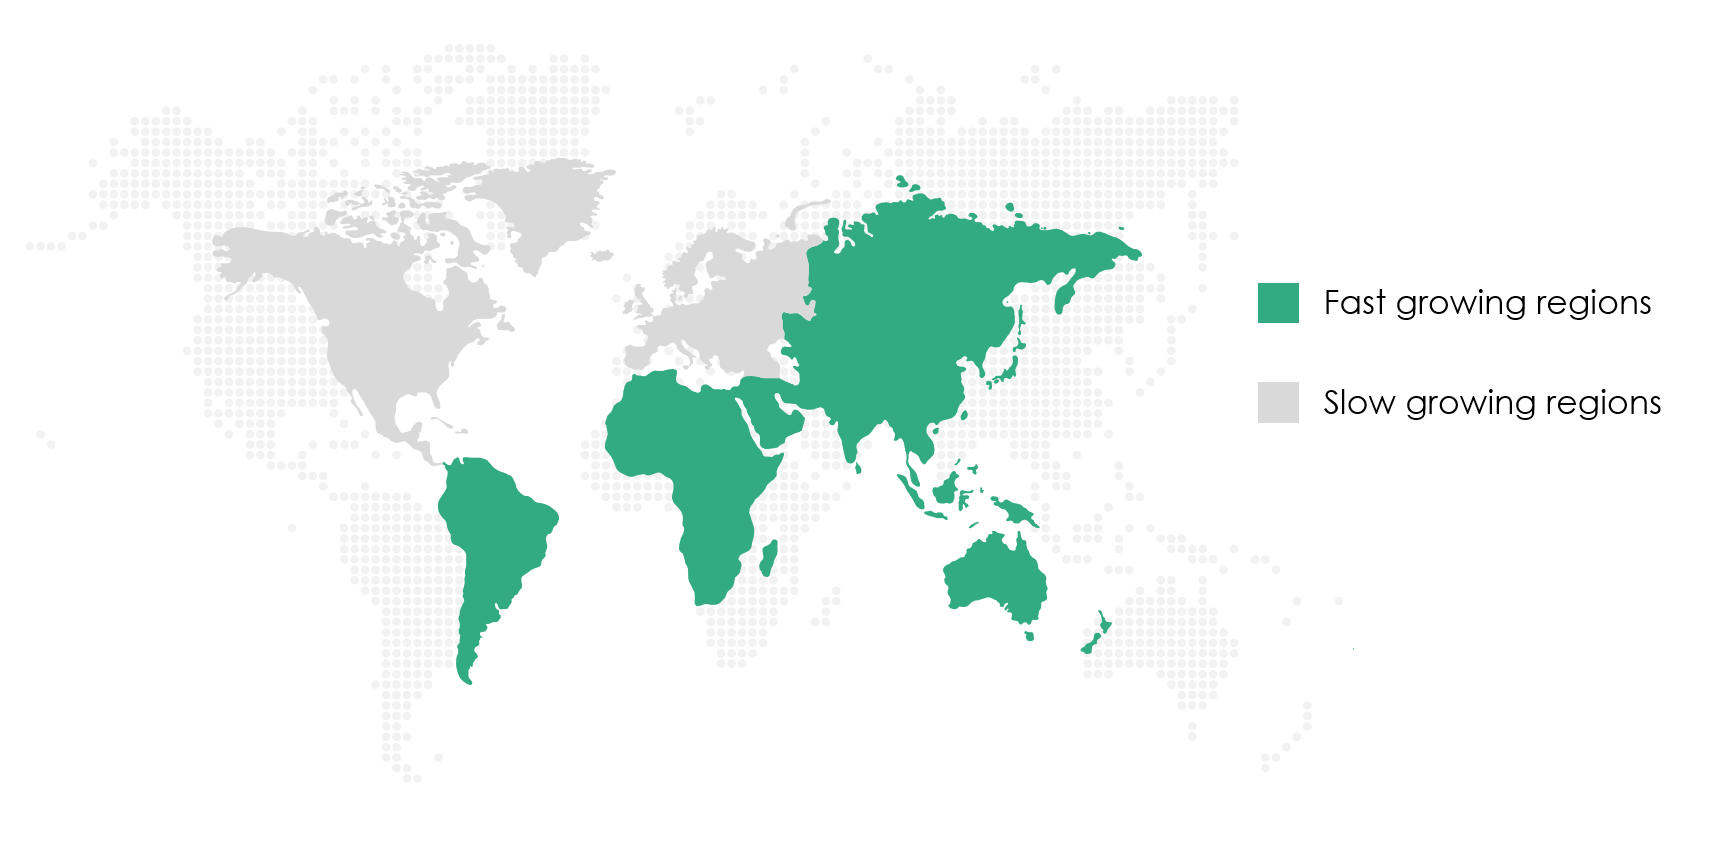 smart-office-solutions-market-share-by-region